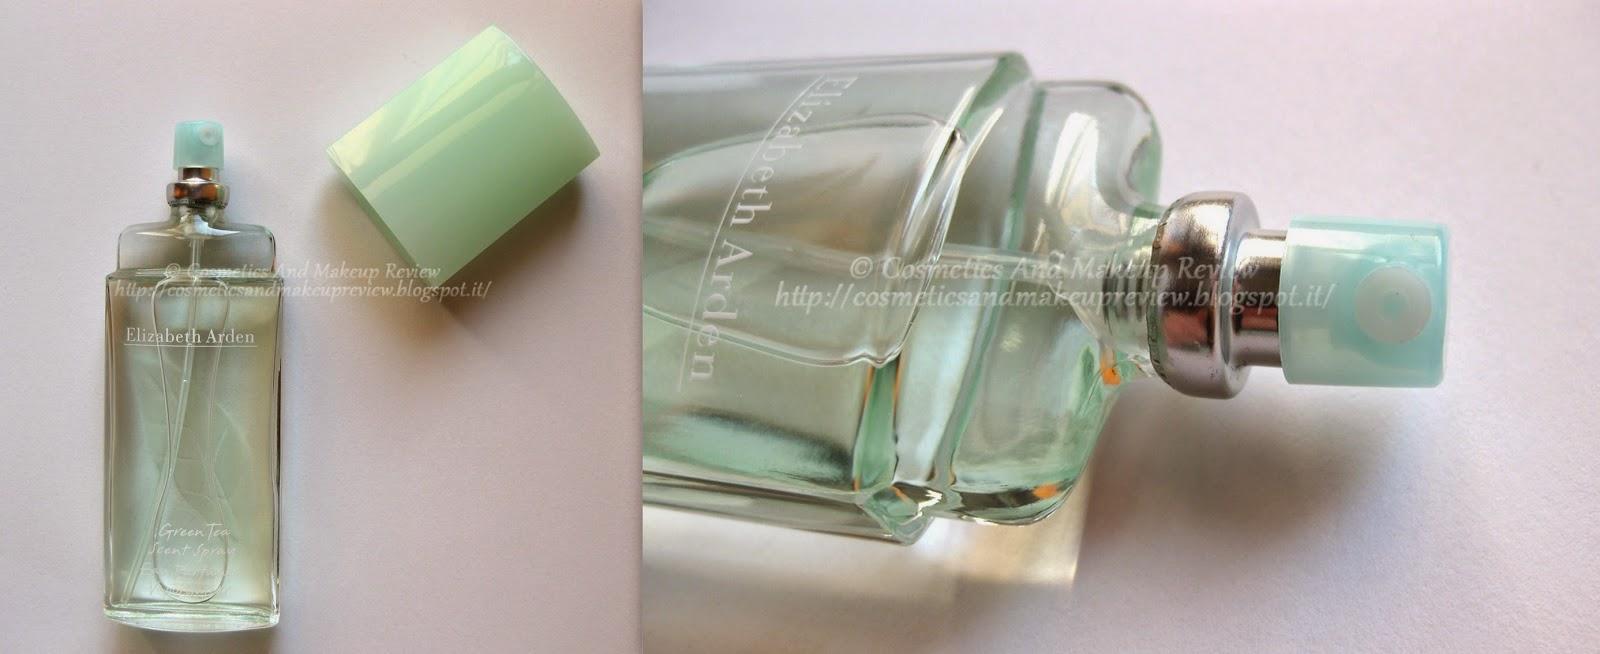 Elizabeth Arden - Green Tea Scent Spray - Eau Parfumée Vaporisateur - erogatore